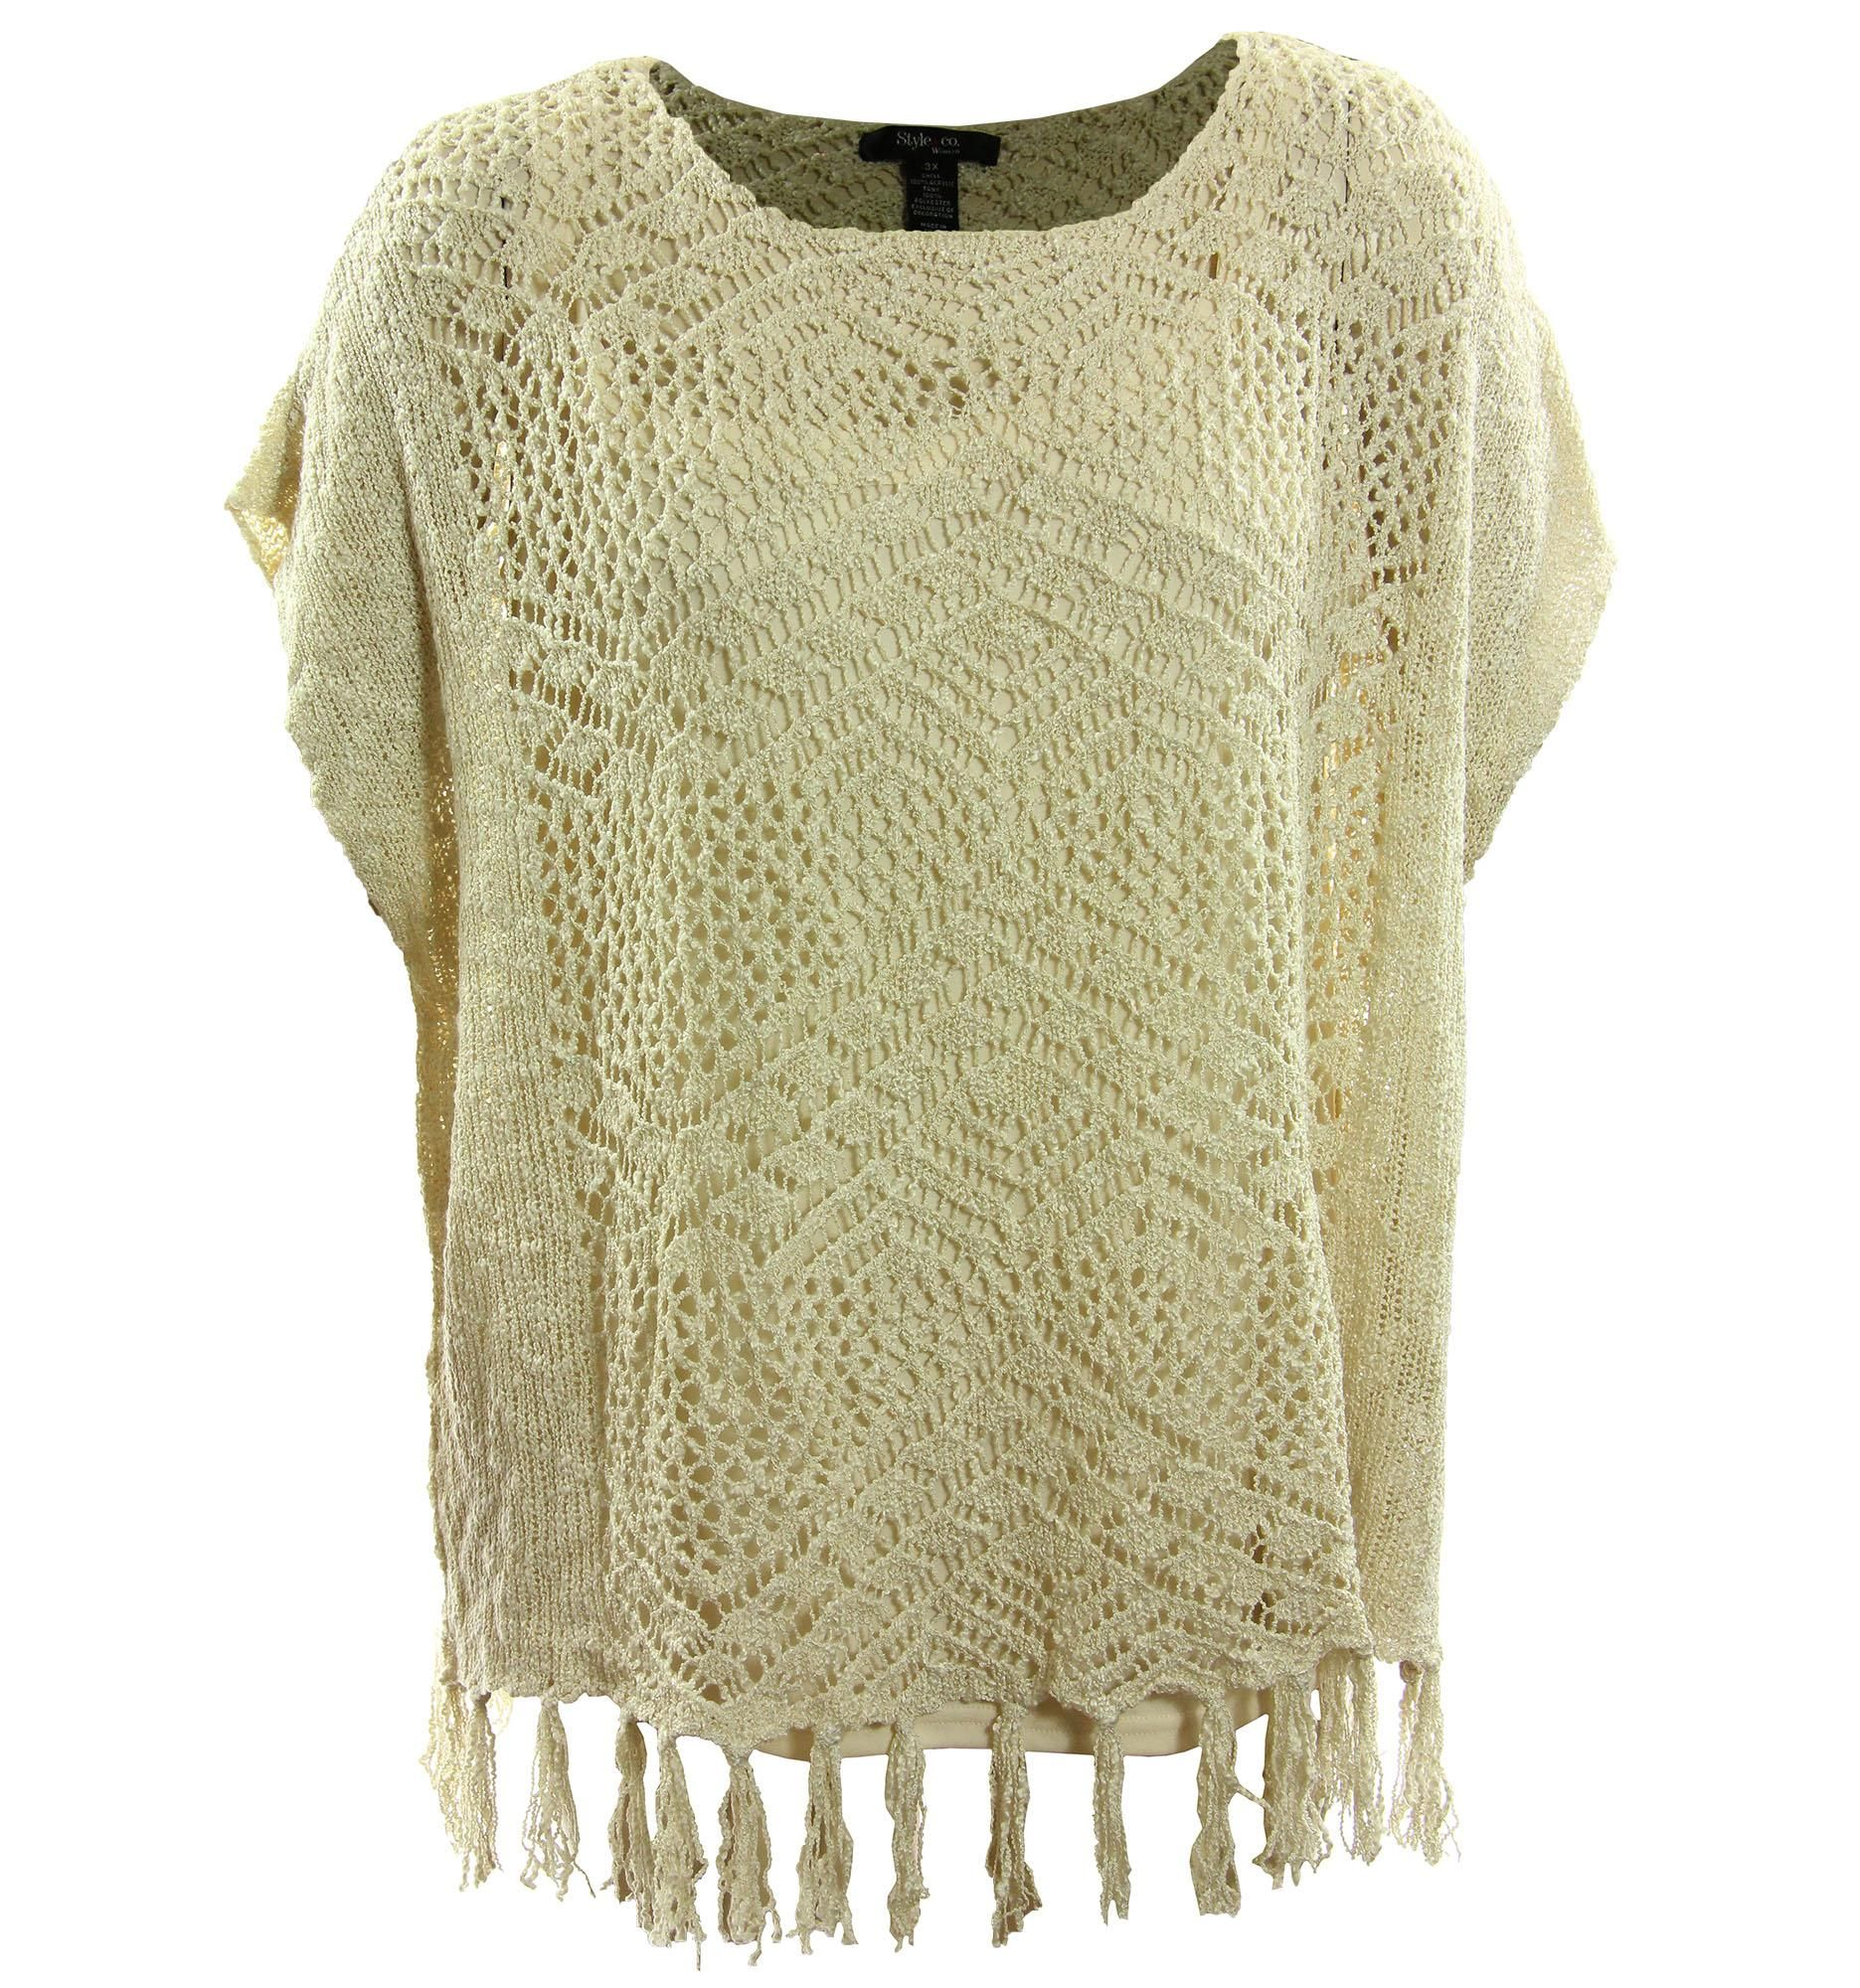 3x Short Sleeve Open Knit Fringed Sweater | Creme brulee, Short ...